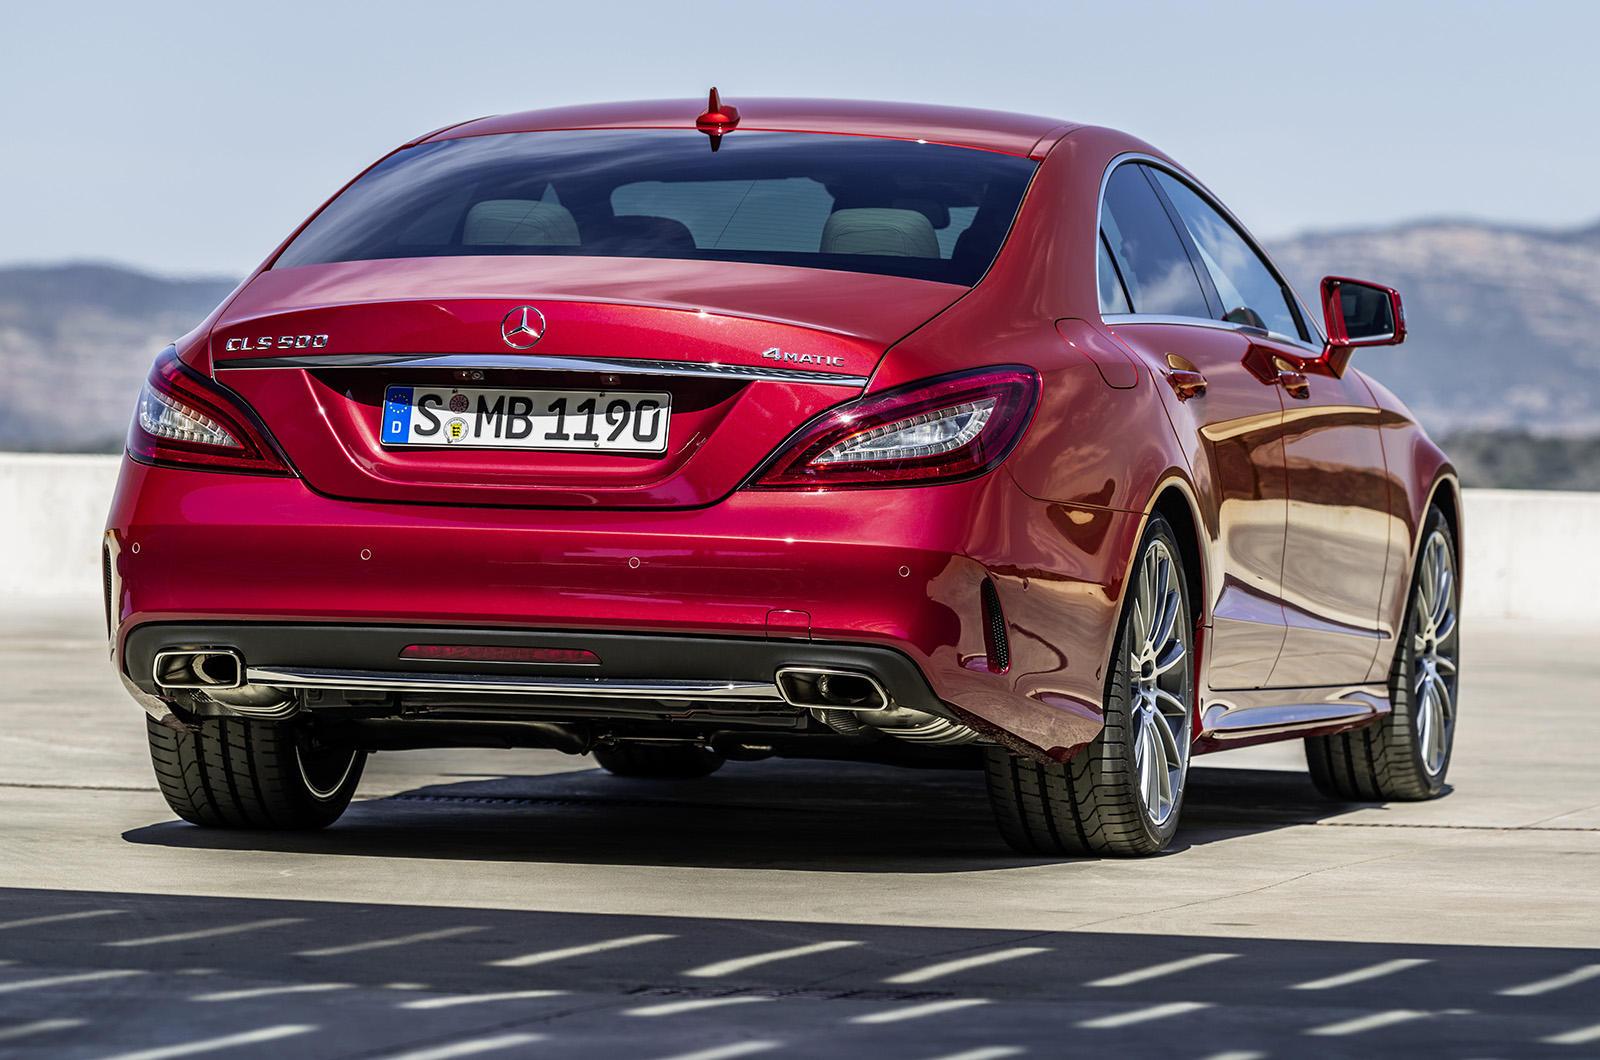 Mercedes CLS Facelift - Mercedes CLS Facelift